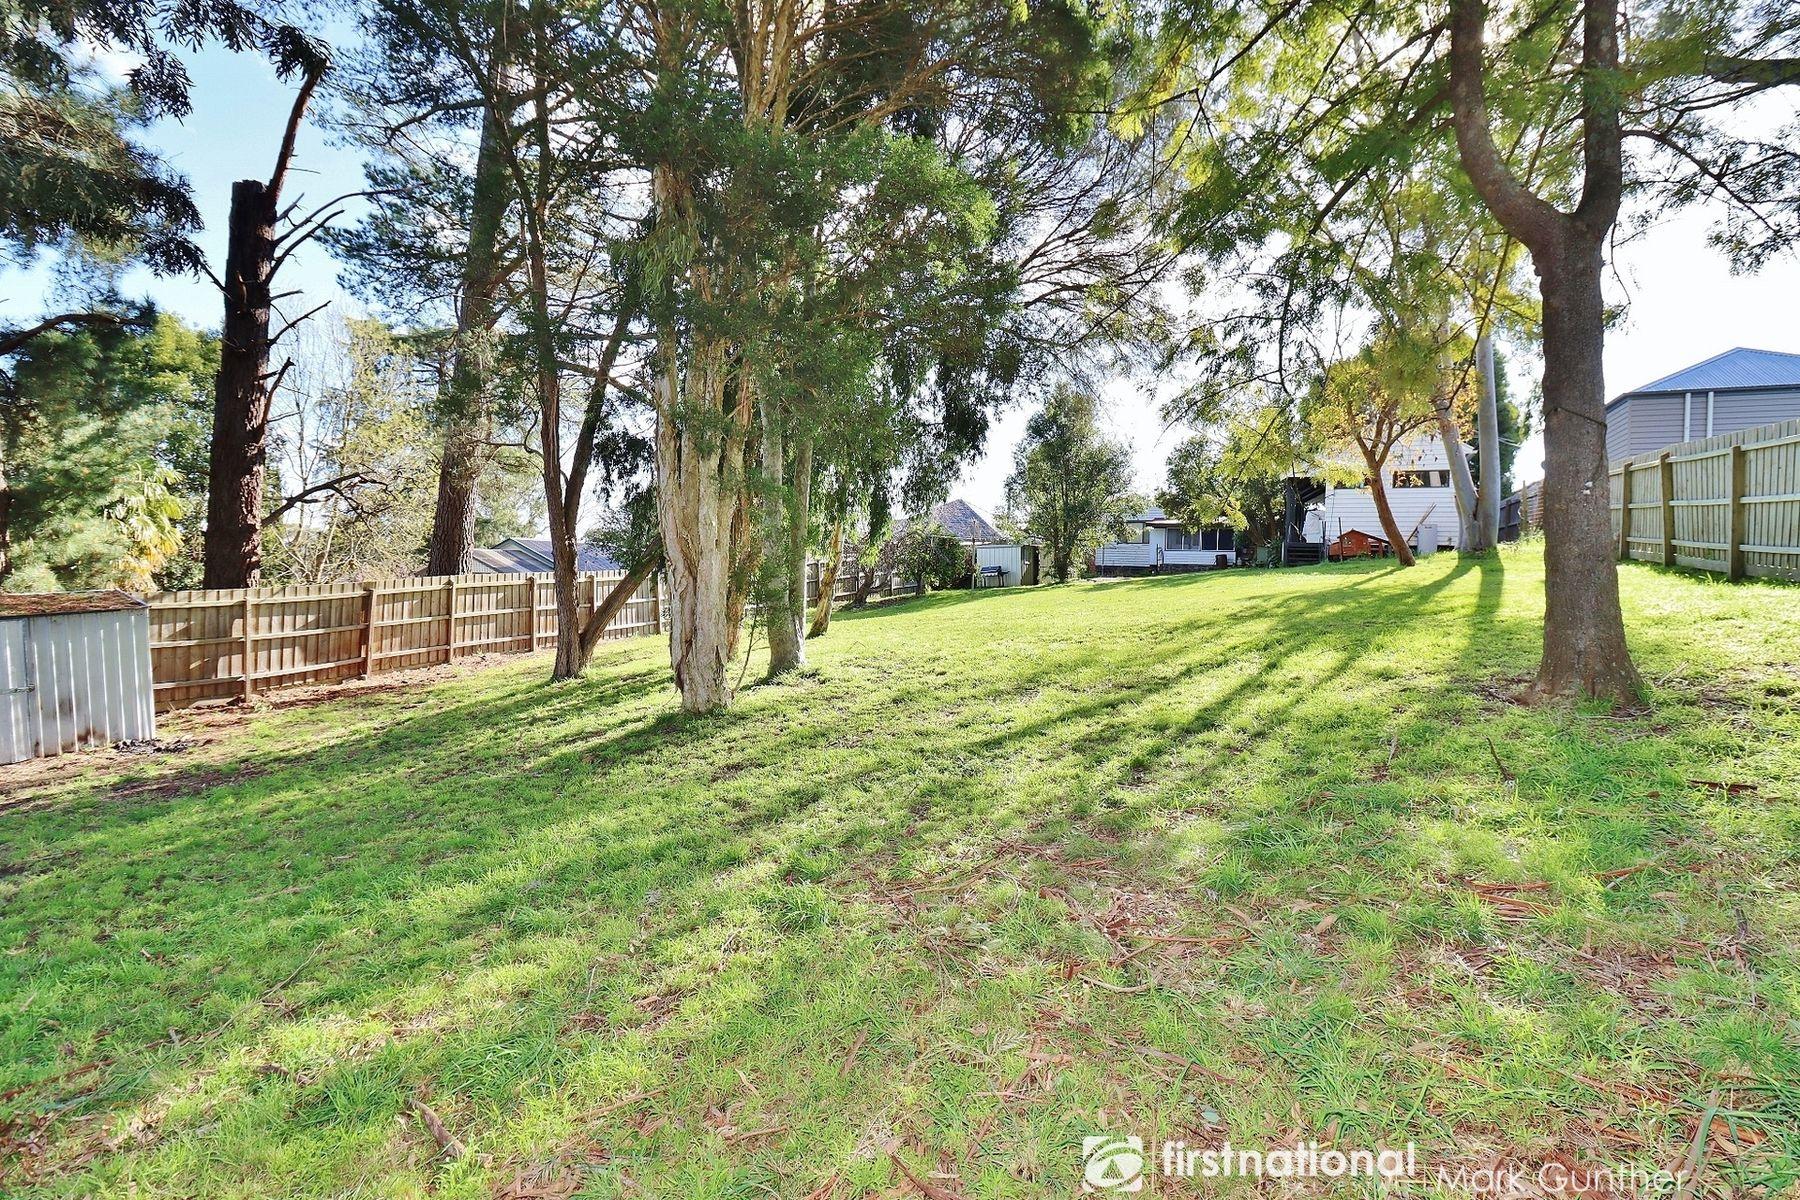 18 & 18a Crowley Road, Healesville, VIC 3777